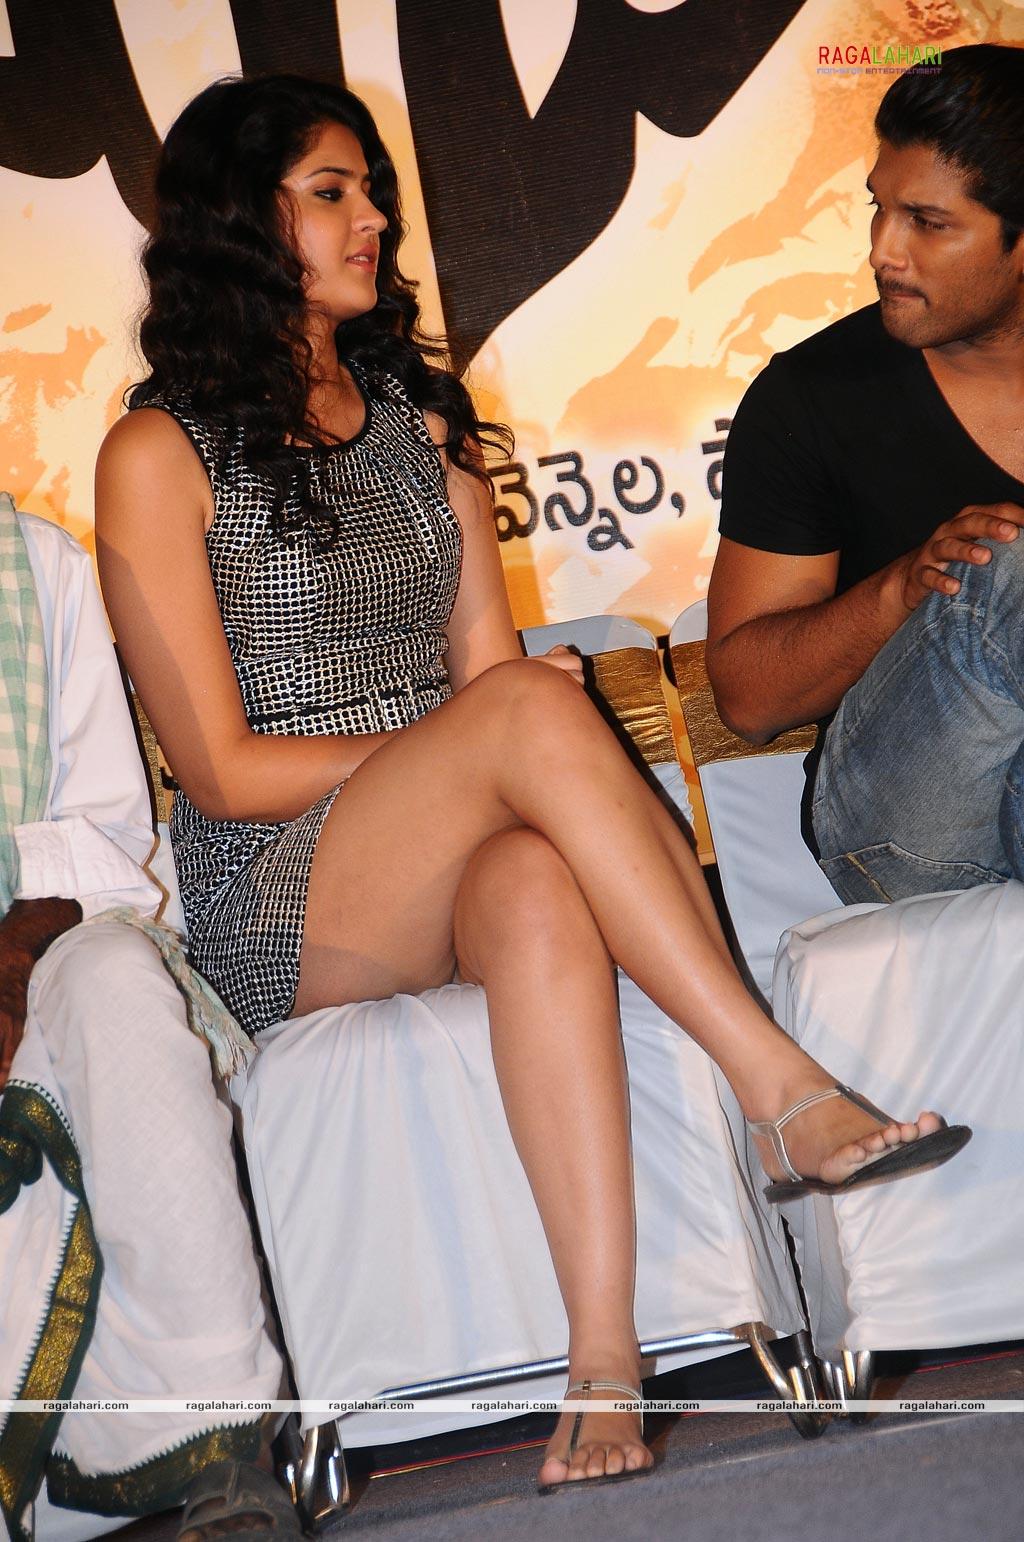 Hot Images Of Indian Actresses Hot Actress Upskirt Images-2308